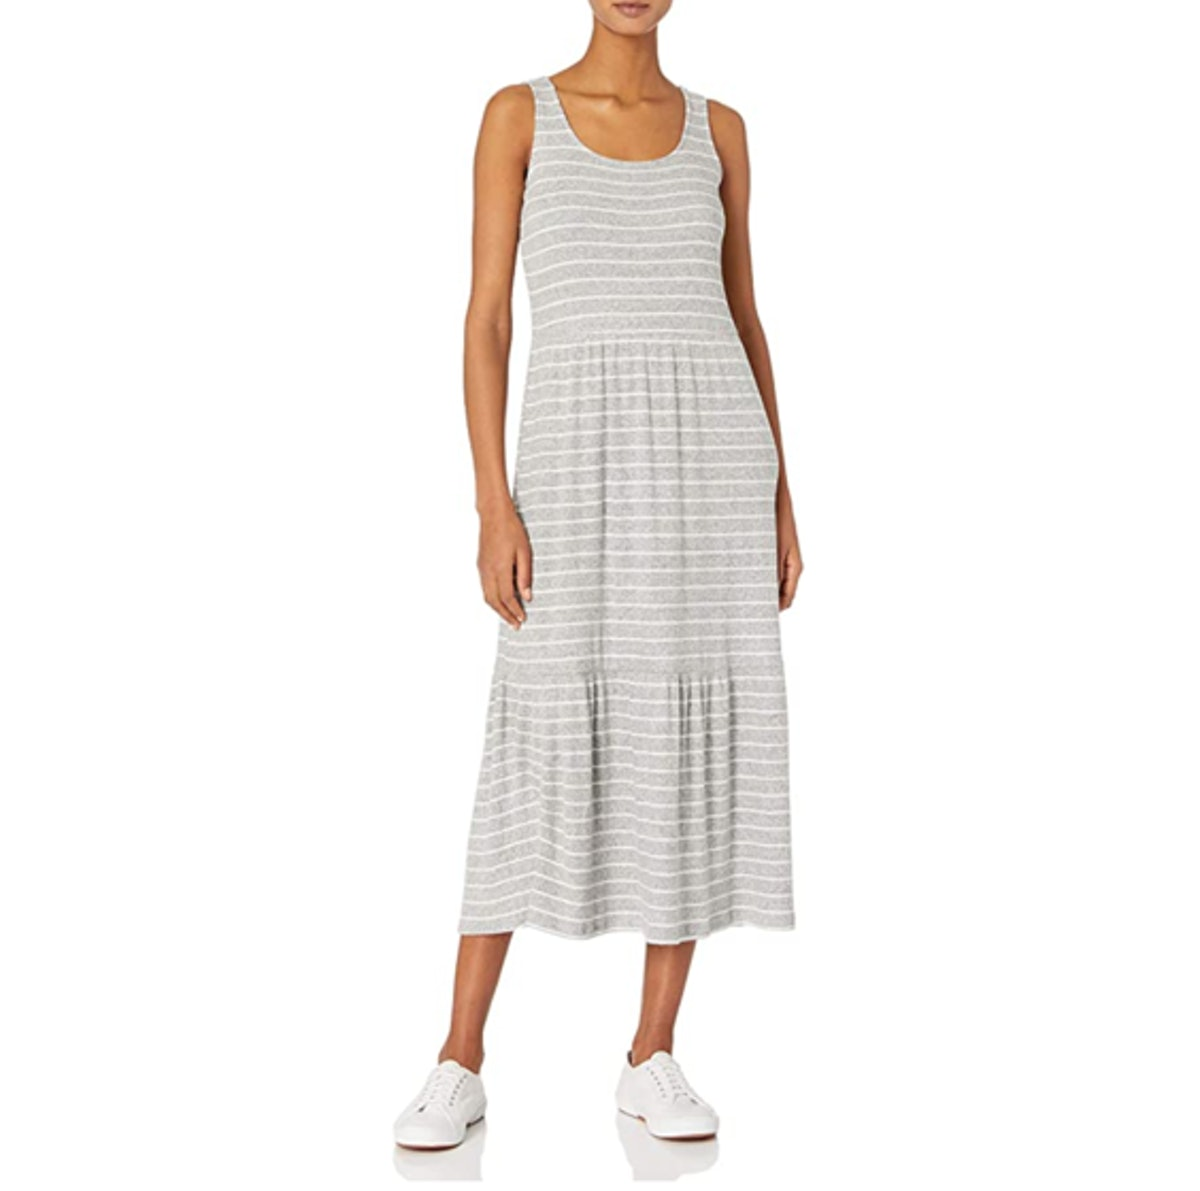 Daily Ritual Tiered Tank Dress